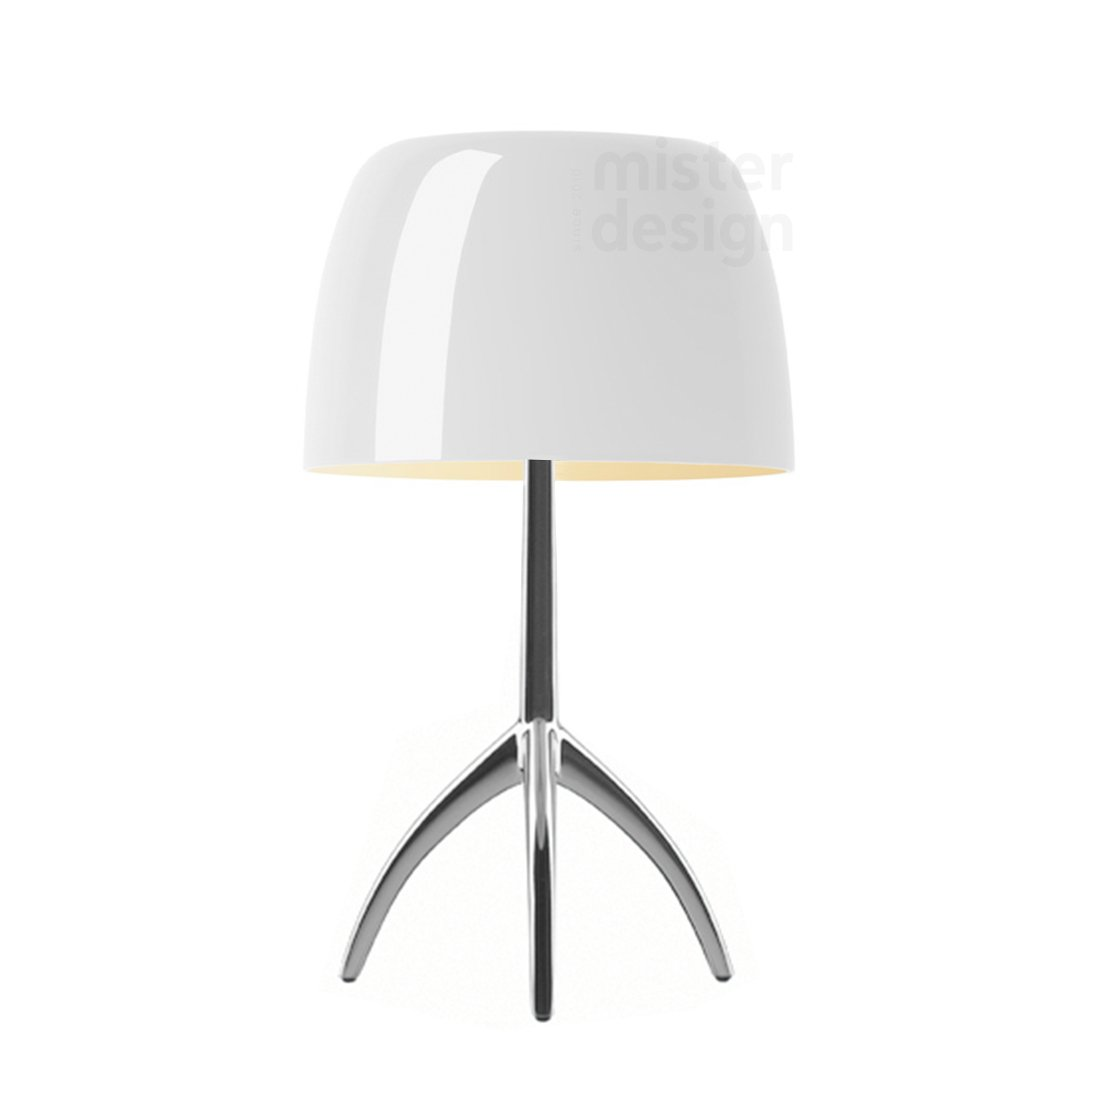 Foscarini Lumiere Piccola Tafellamp - Warm Wit - Aluminium